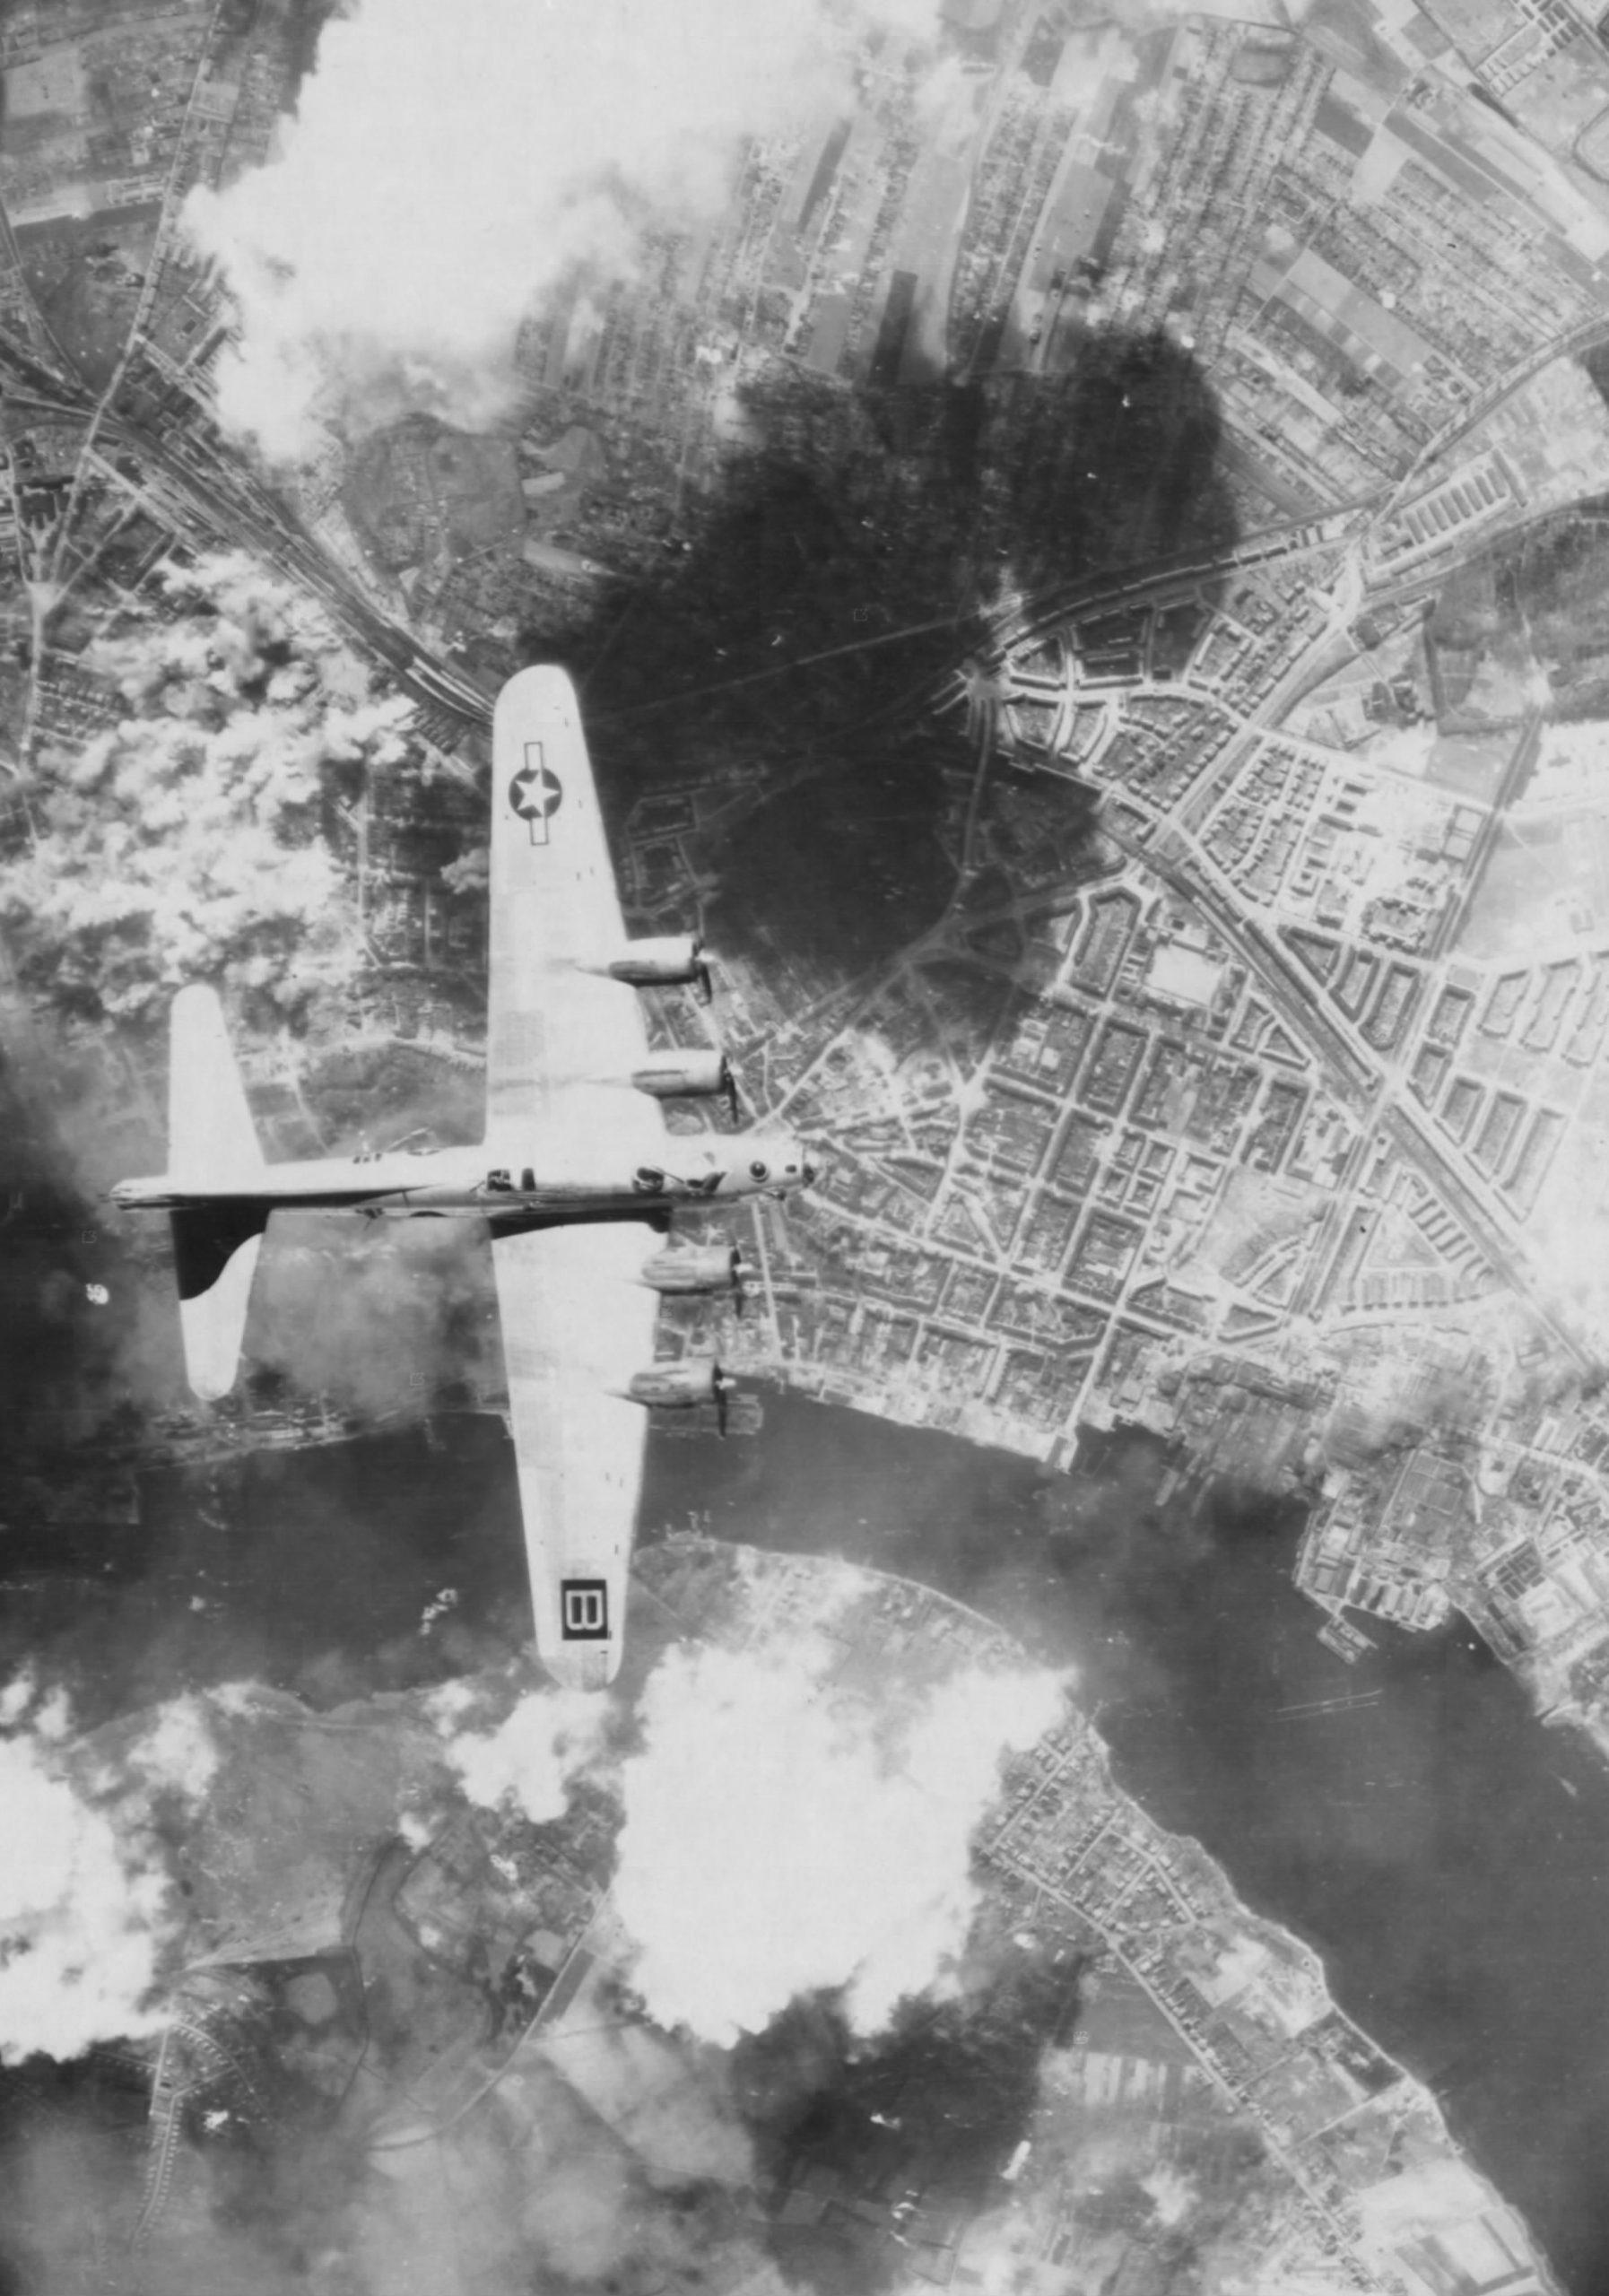 B-17 #42-32066 / Silver Sliver